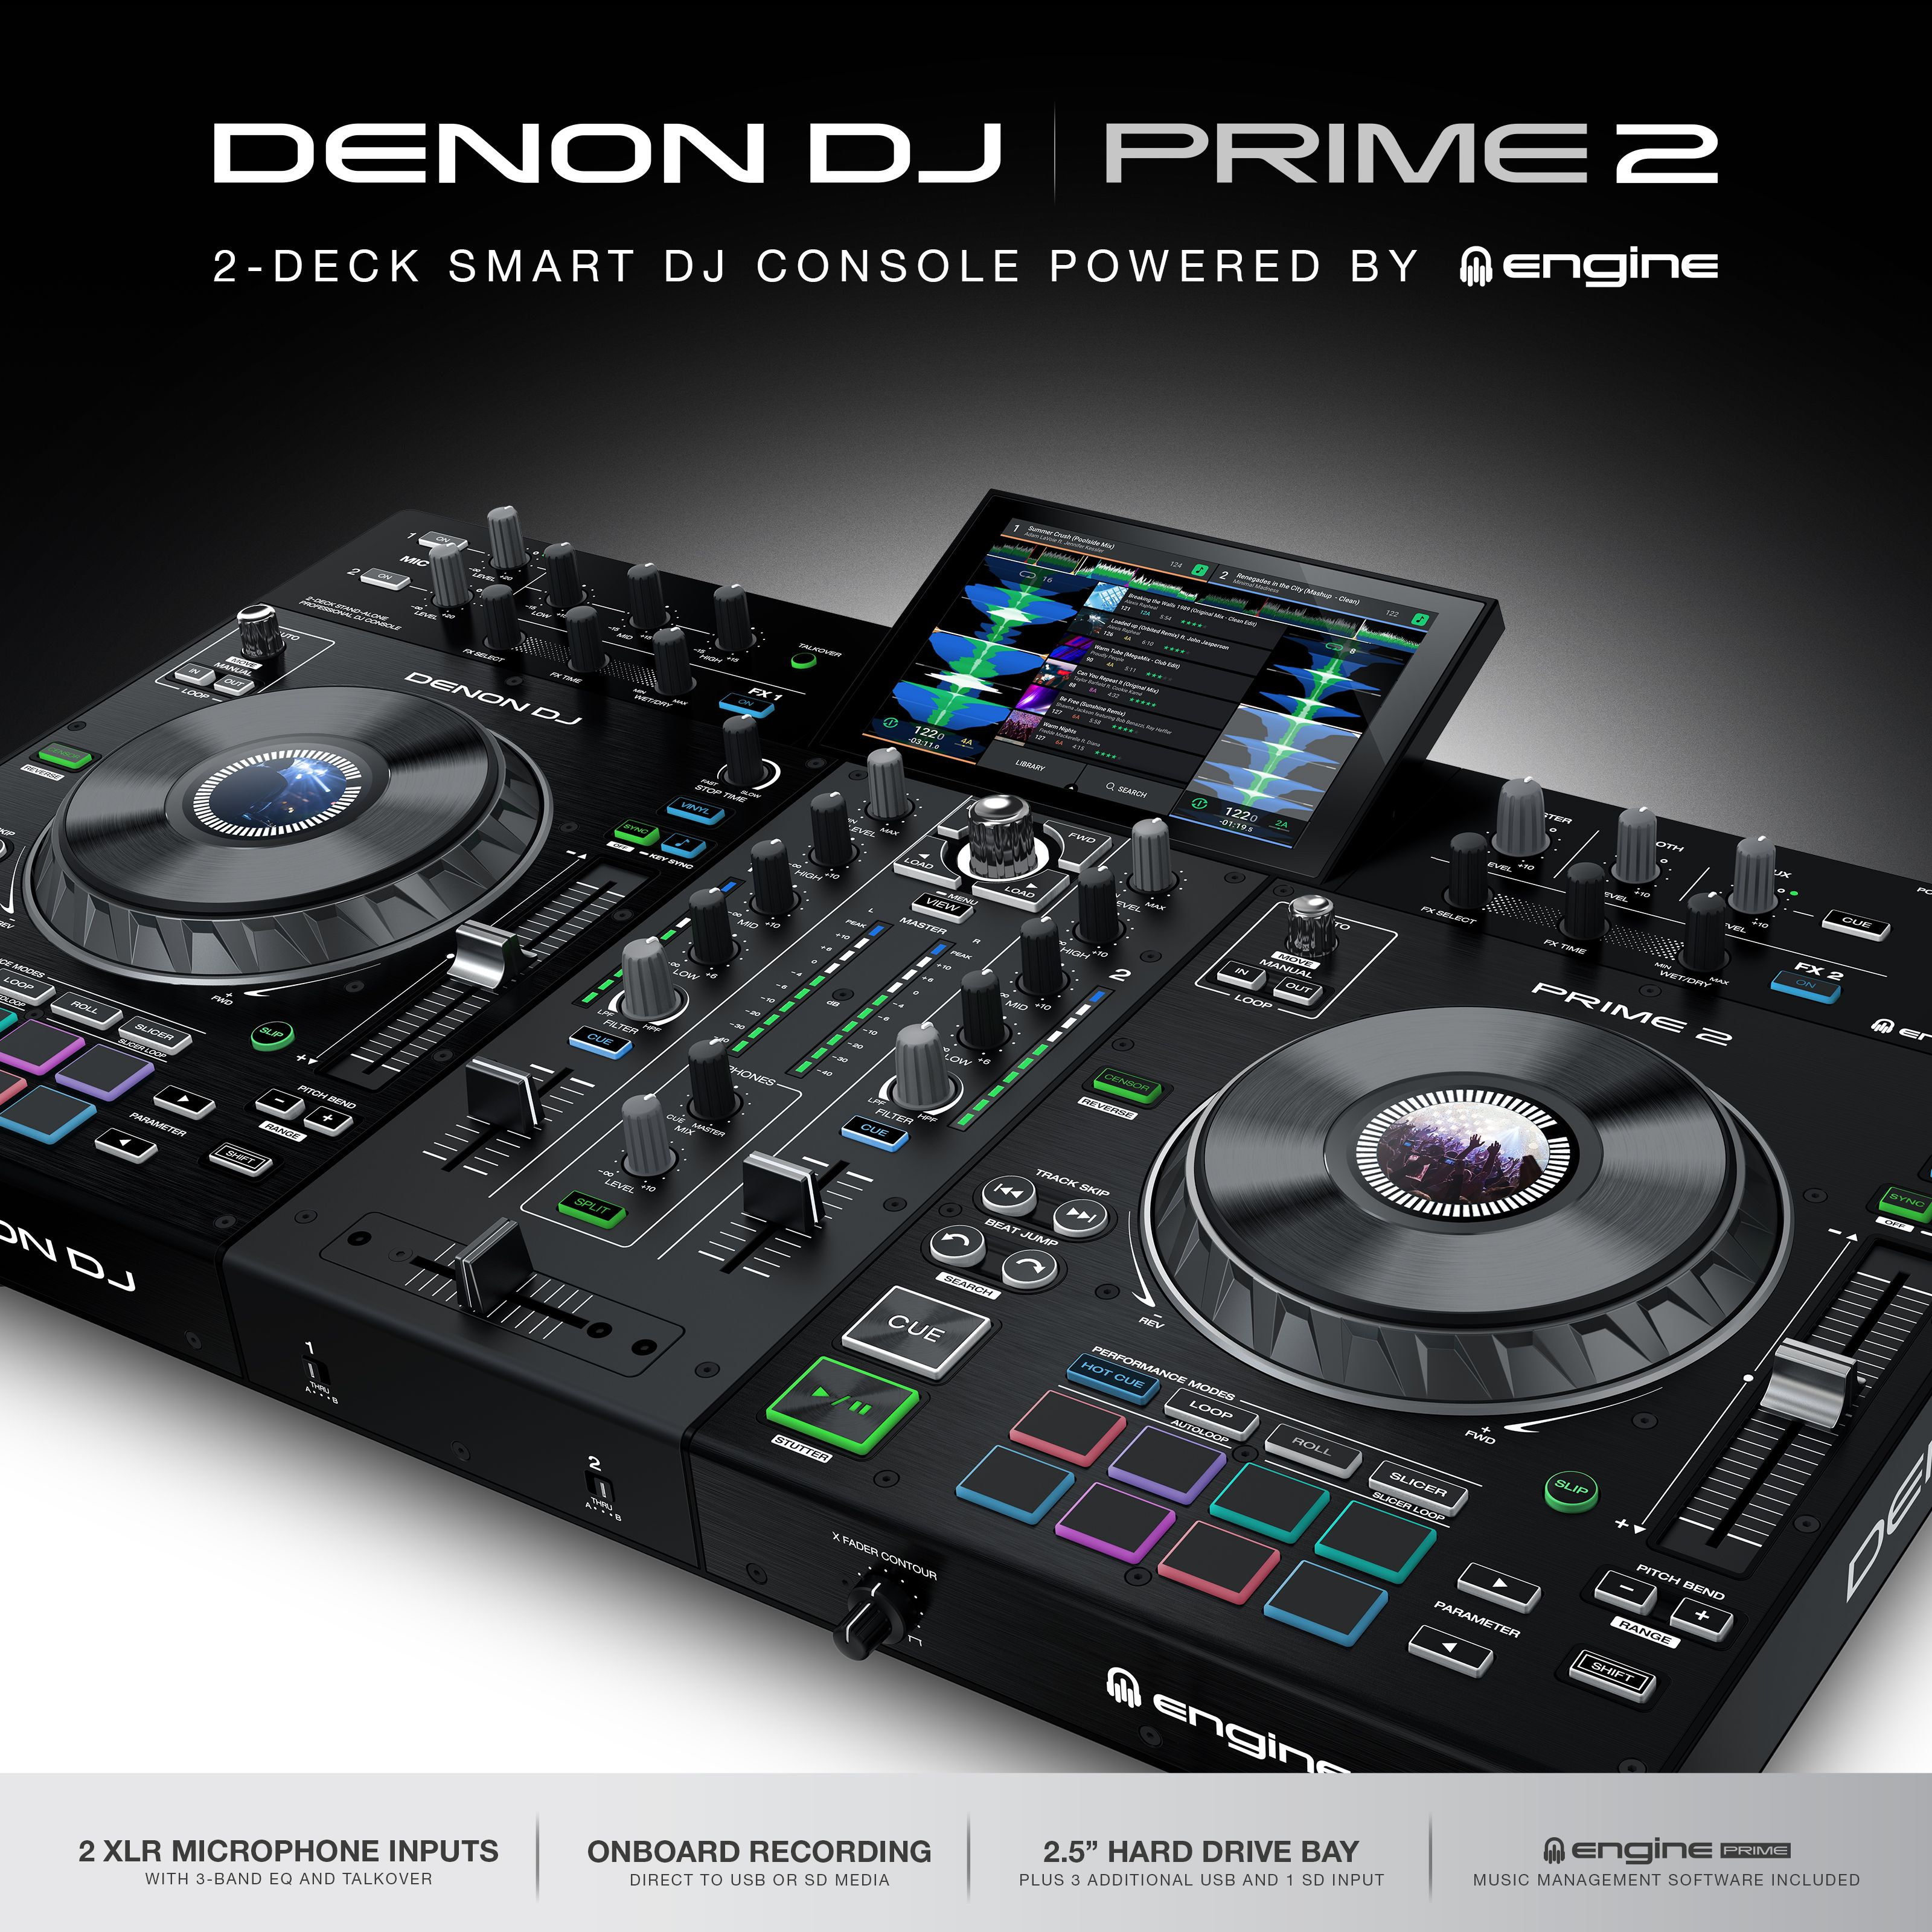 Denon Dj Prime 2 2 Deck Standalone Dj System With 7 Inch Touchscreen Dj System Pioneer Dj Dj Equipment